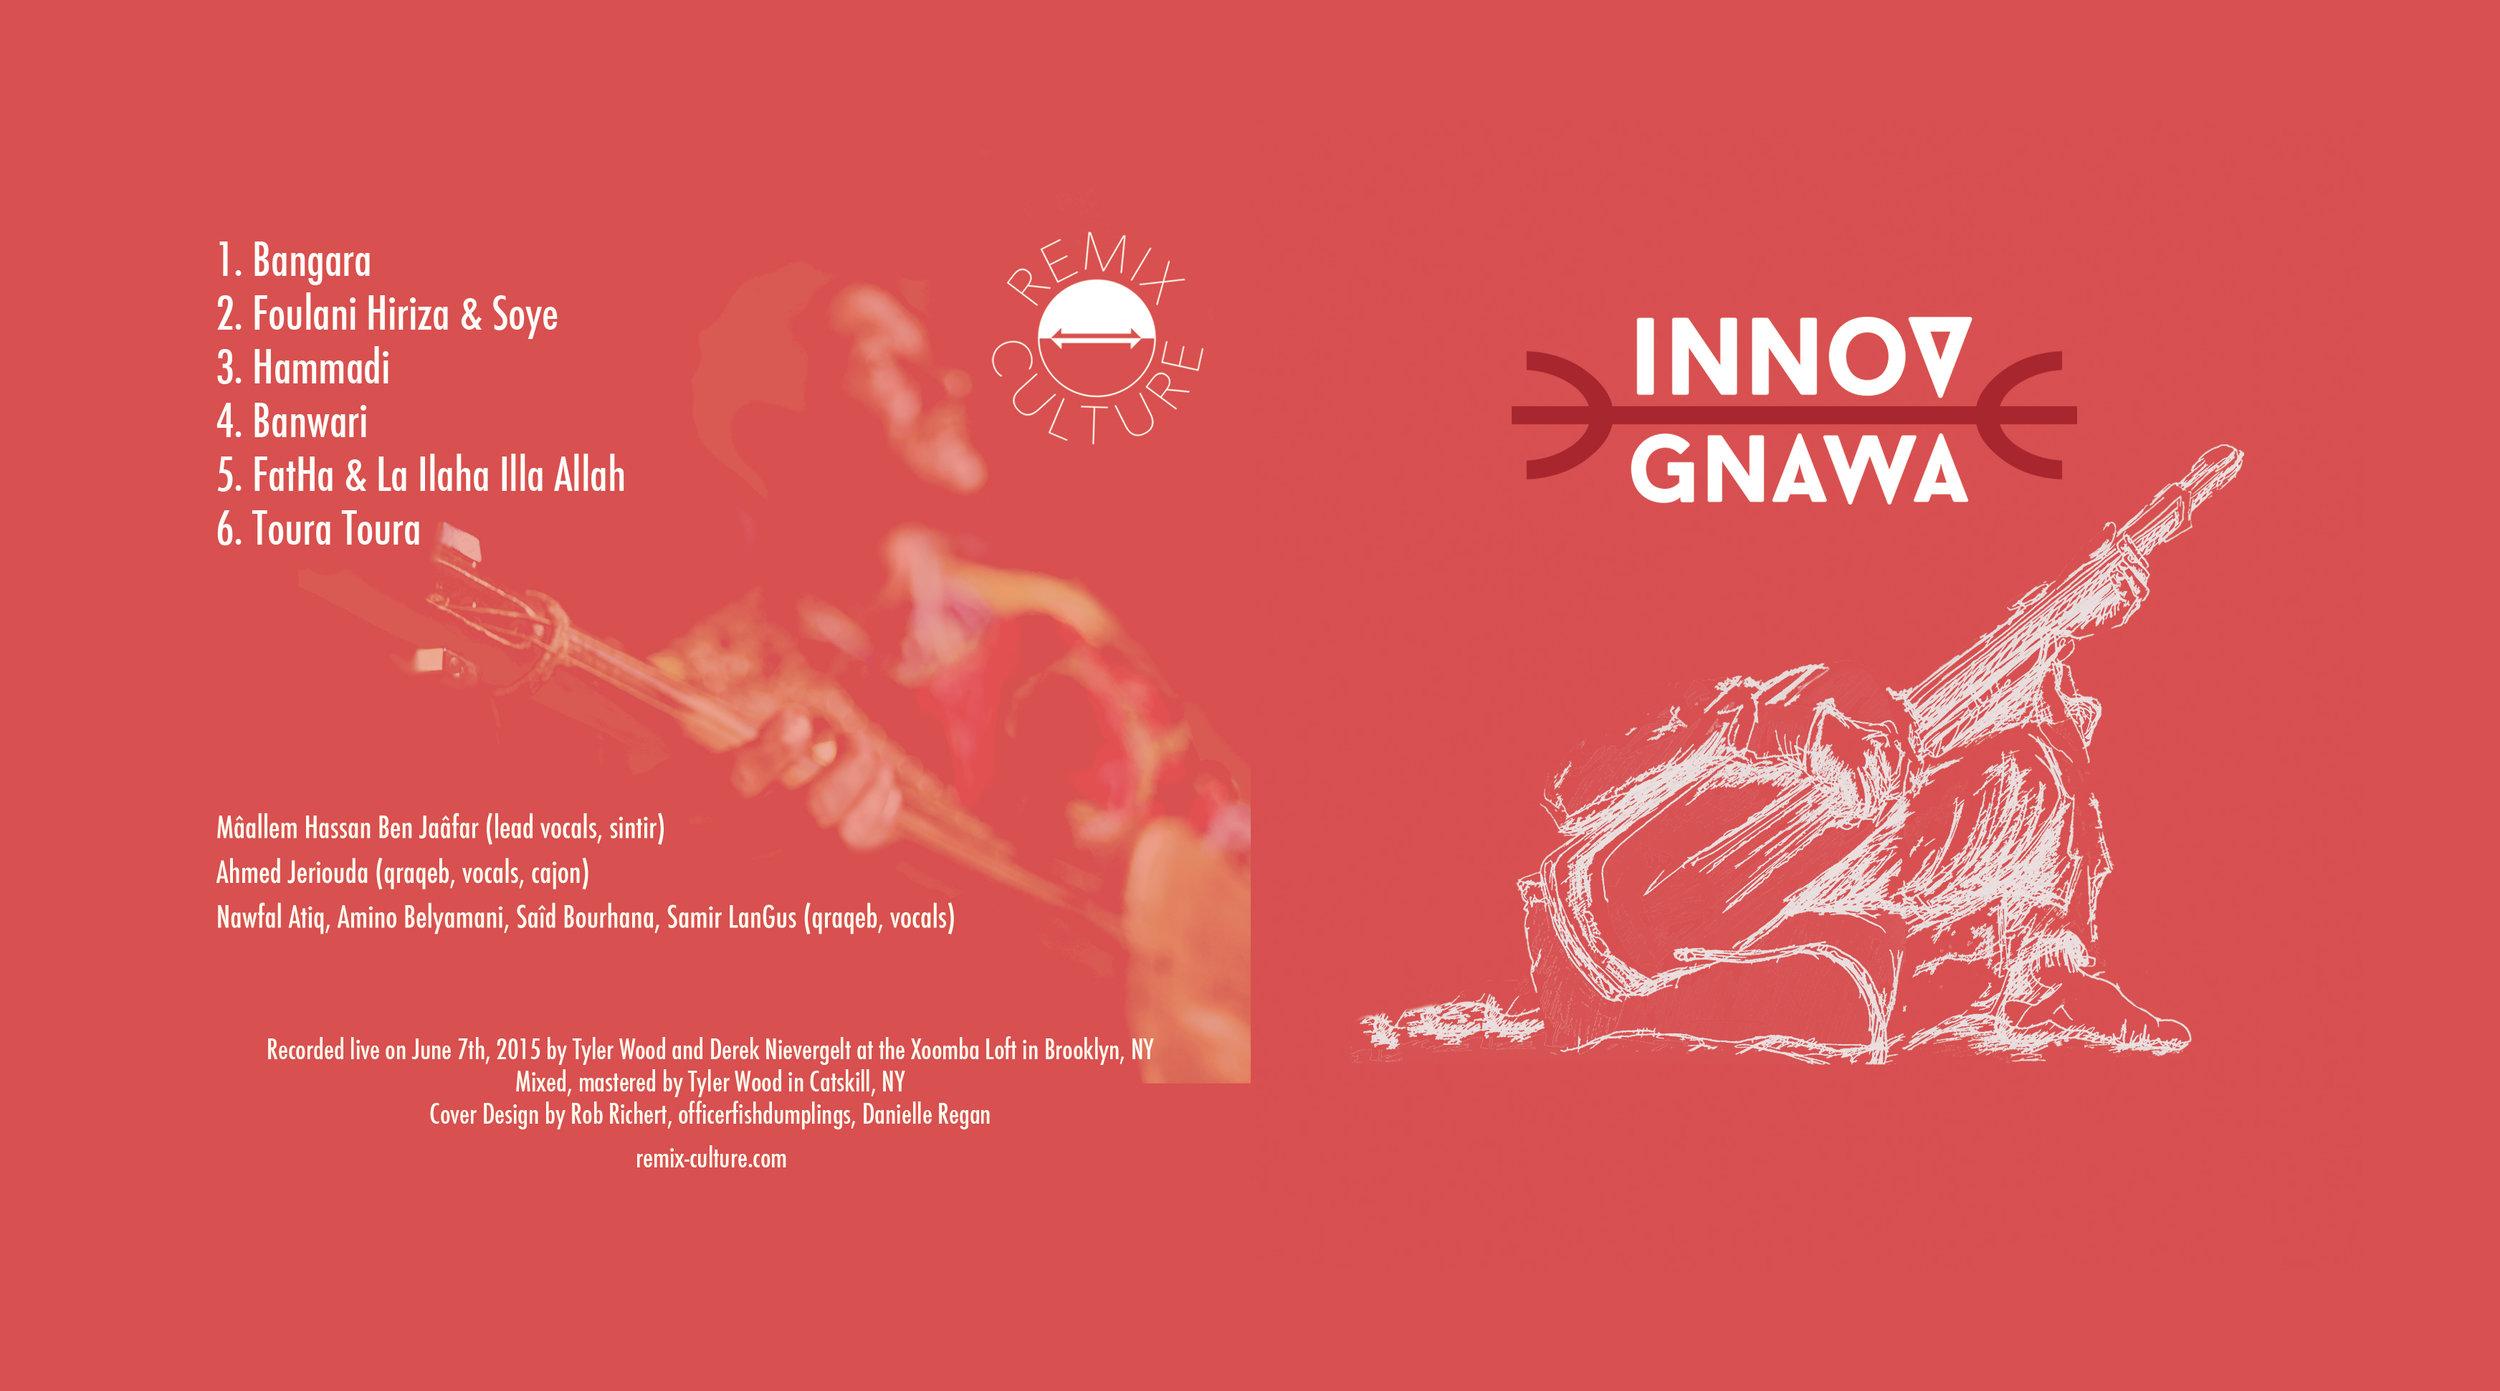 Innov Gnawa - CD - Listen, then buy